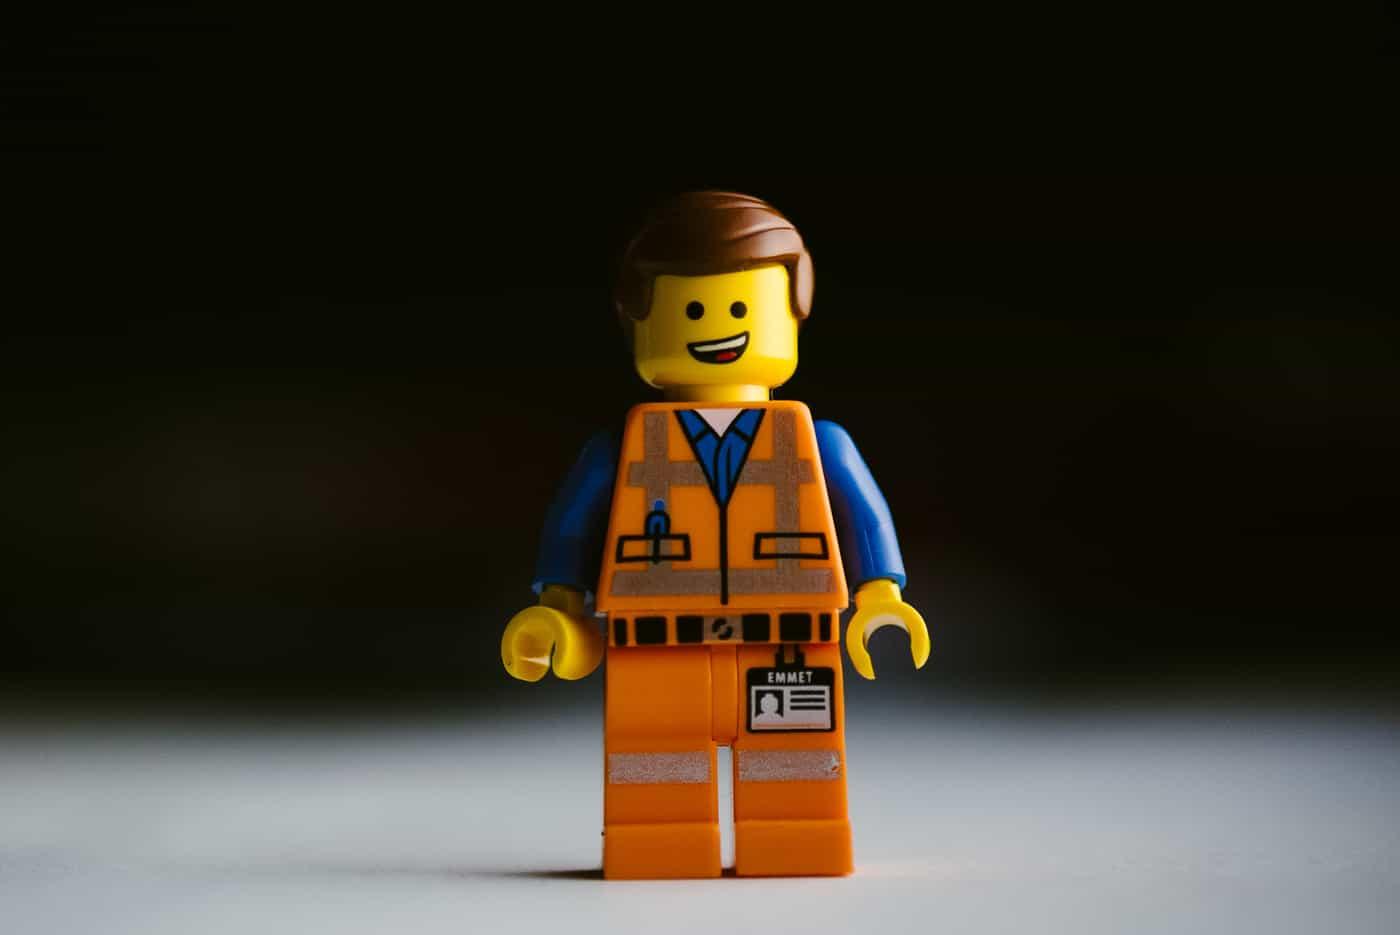 Emmet LEGO minifigure smiling face